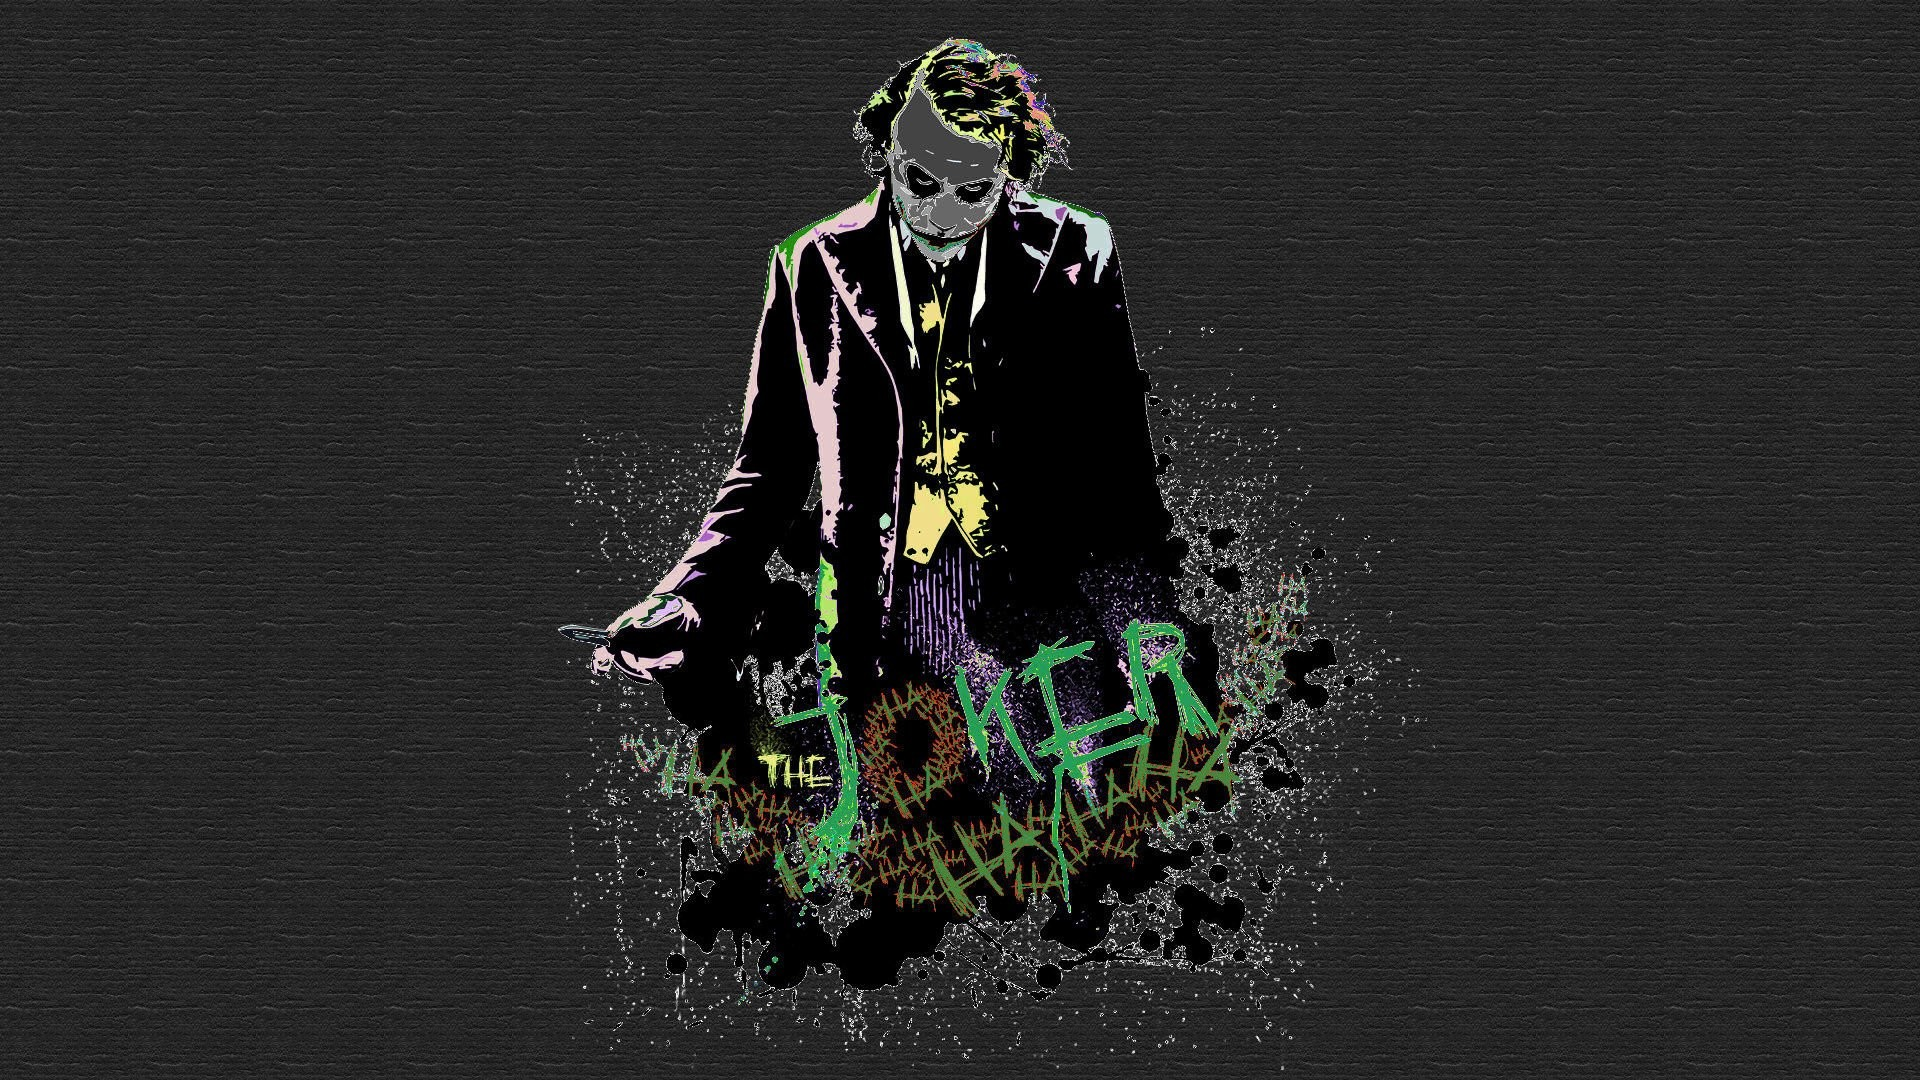 Best Dark Wallpapers For Iphone X Evil Joker Wallpaper 78 Images